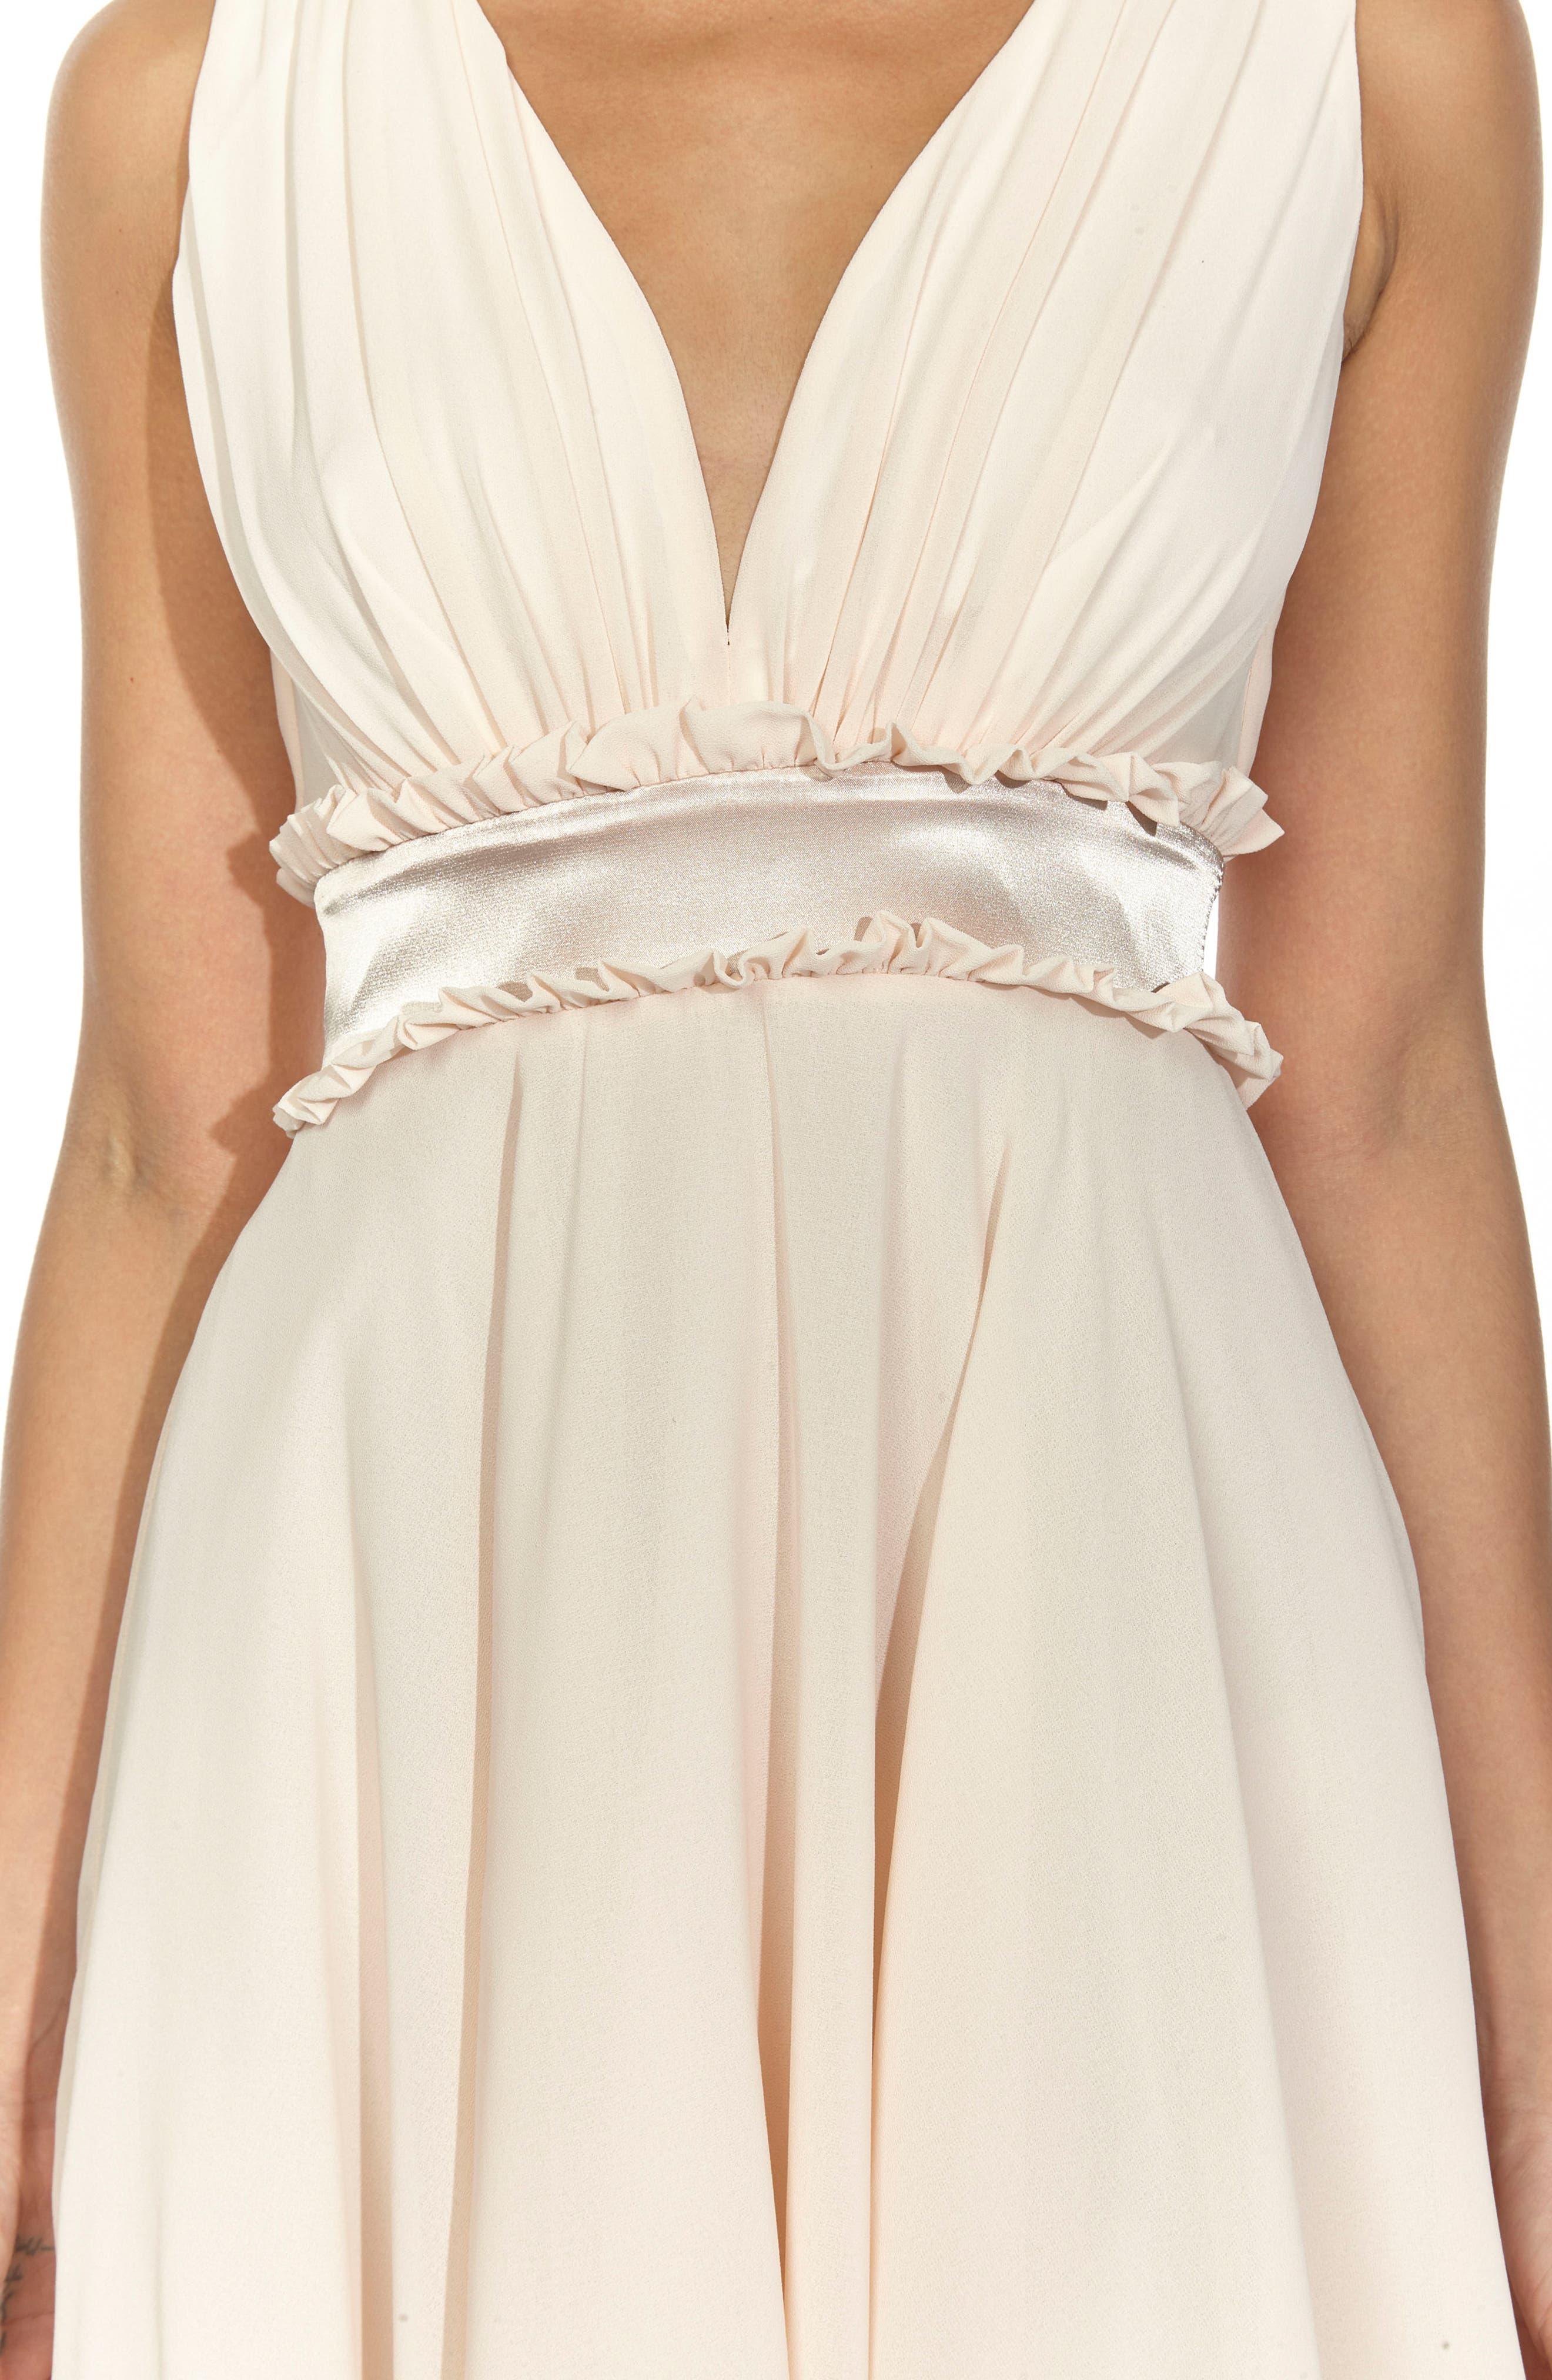 Joany Ruffle Waist Fit & Flare Dress,                             Alternate thumbnail 4, color,                             250